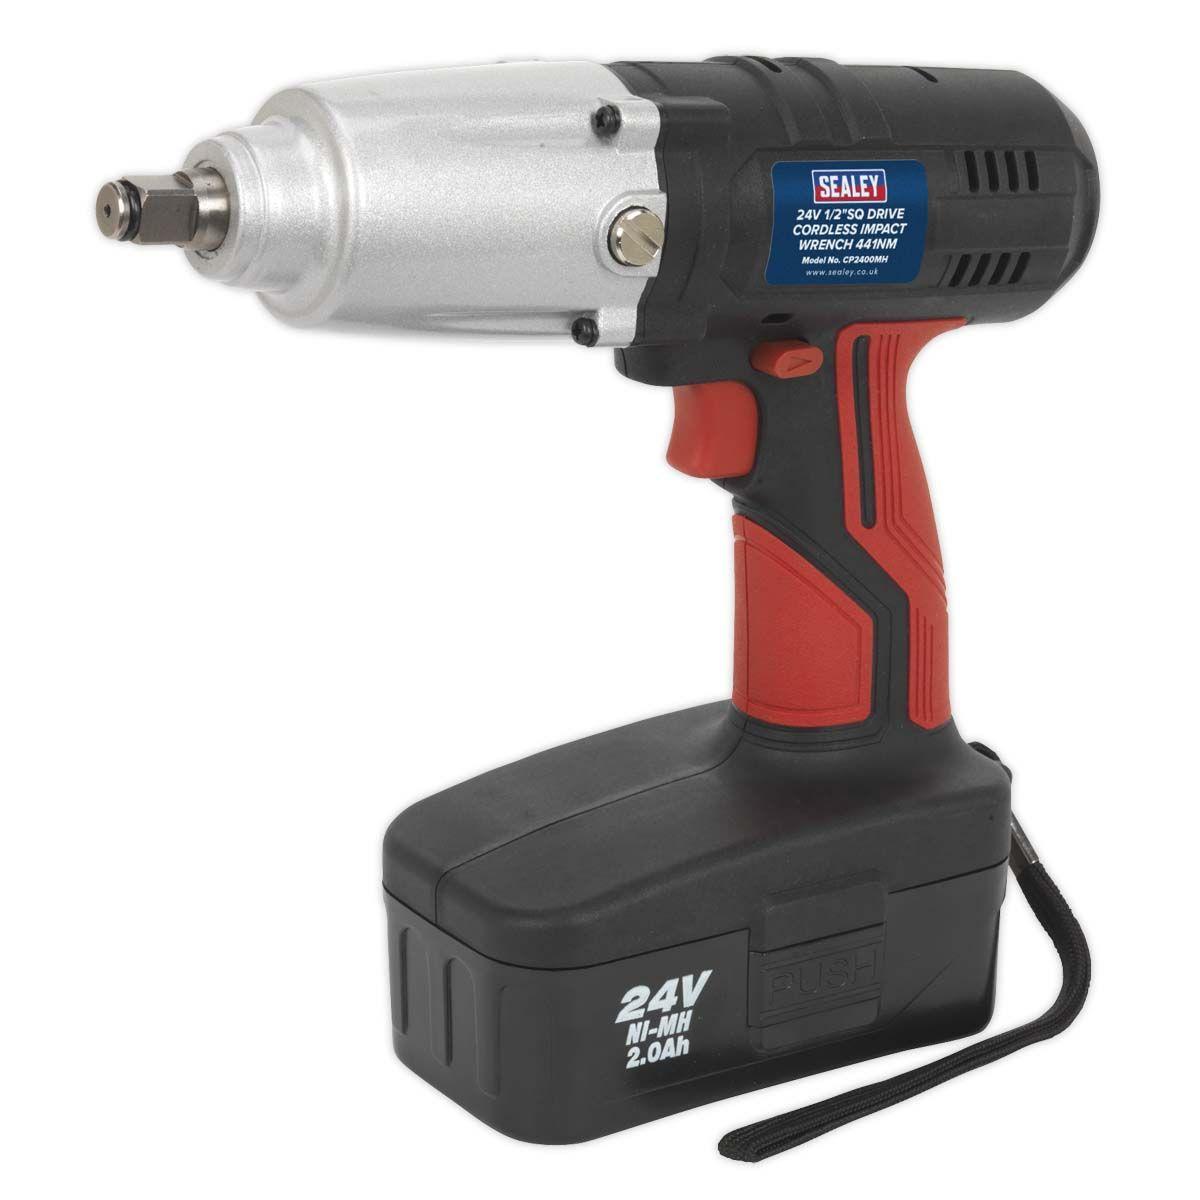 "Sealey Cordless Impact Wrench 24V 2Ah Ni-MH 1/2""Sq Drive 441Nm"